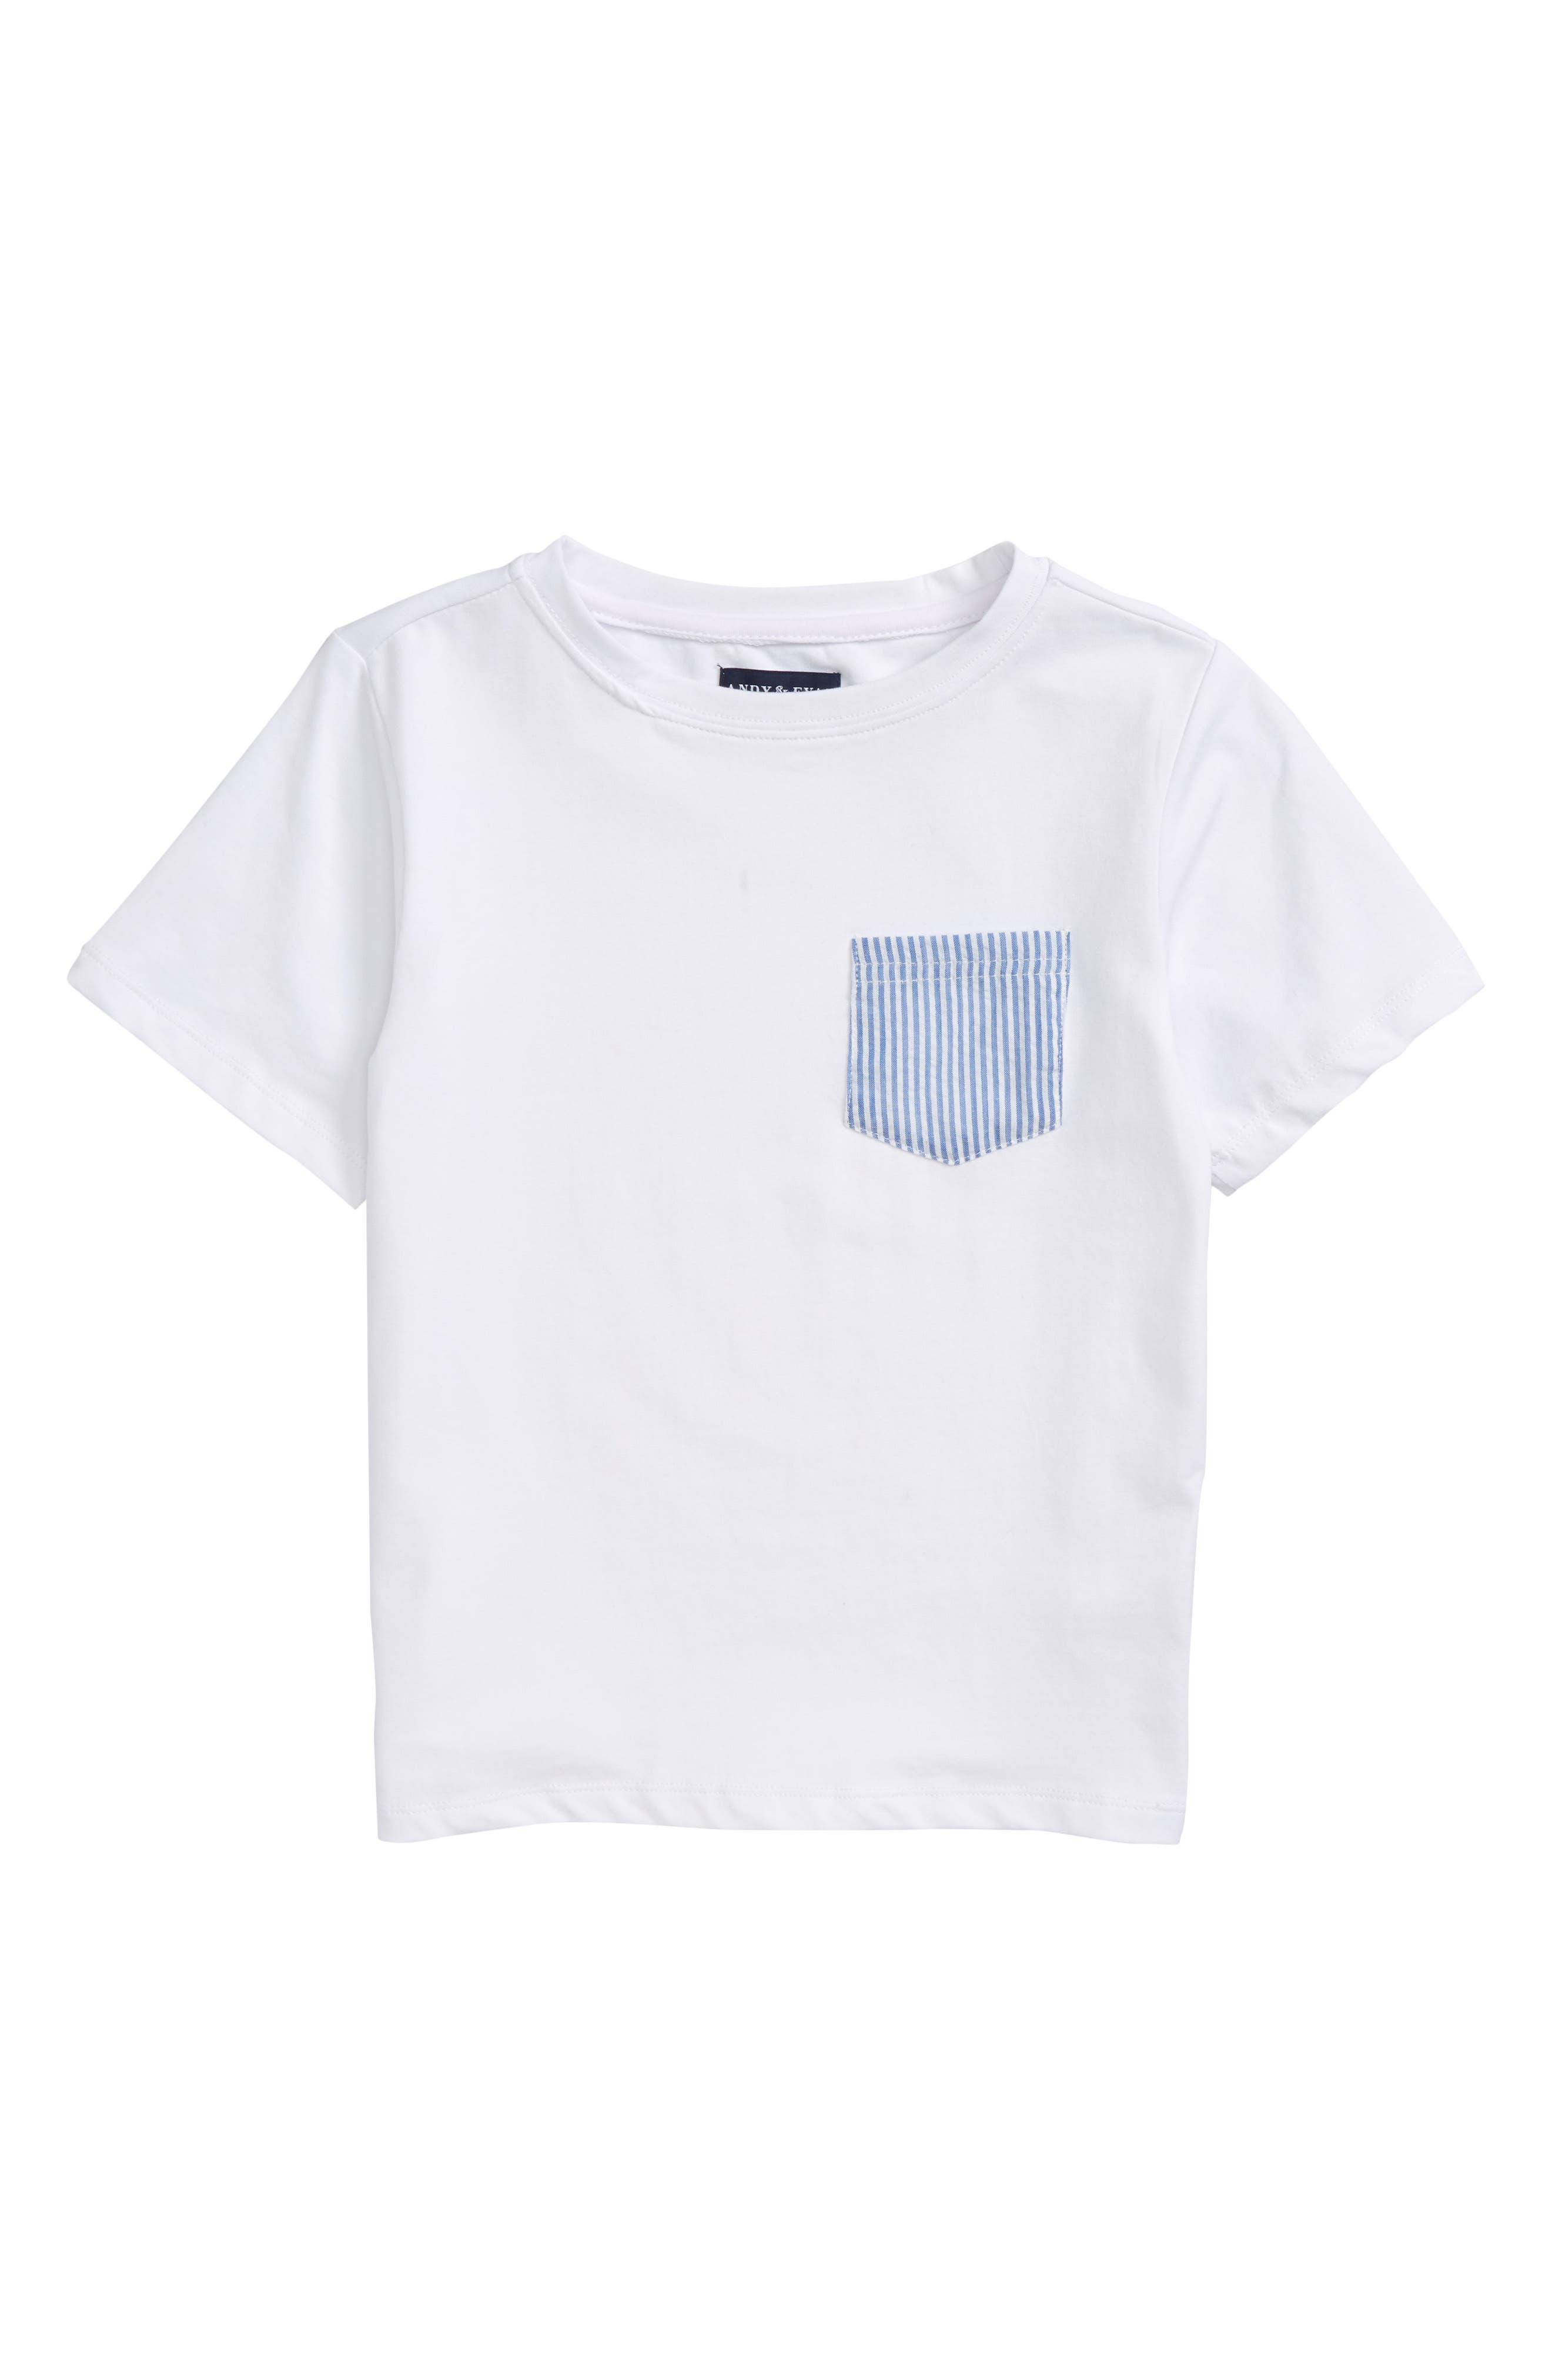 Seersucker Pocket T-Shirt,                             Main thumbnail 1, color,                             White